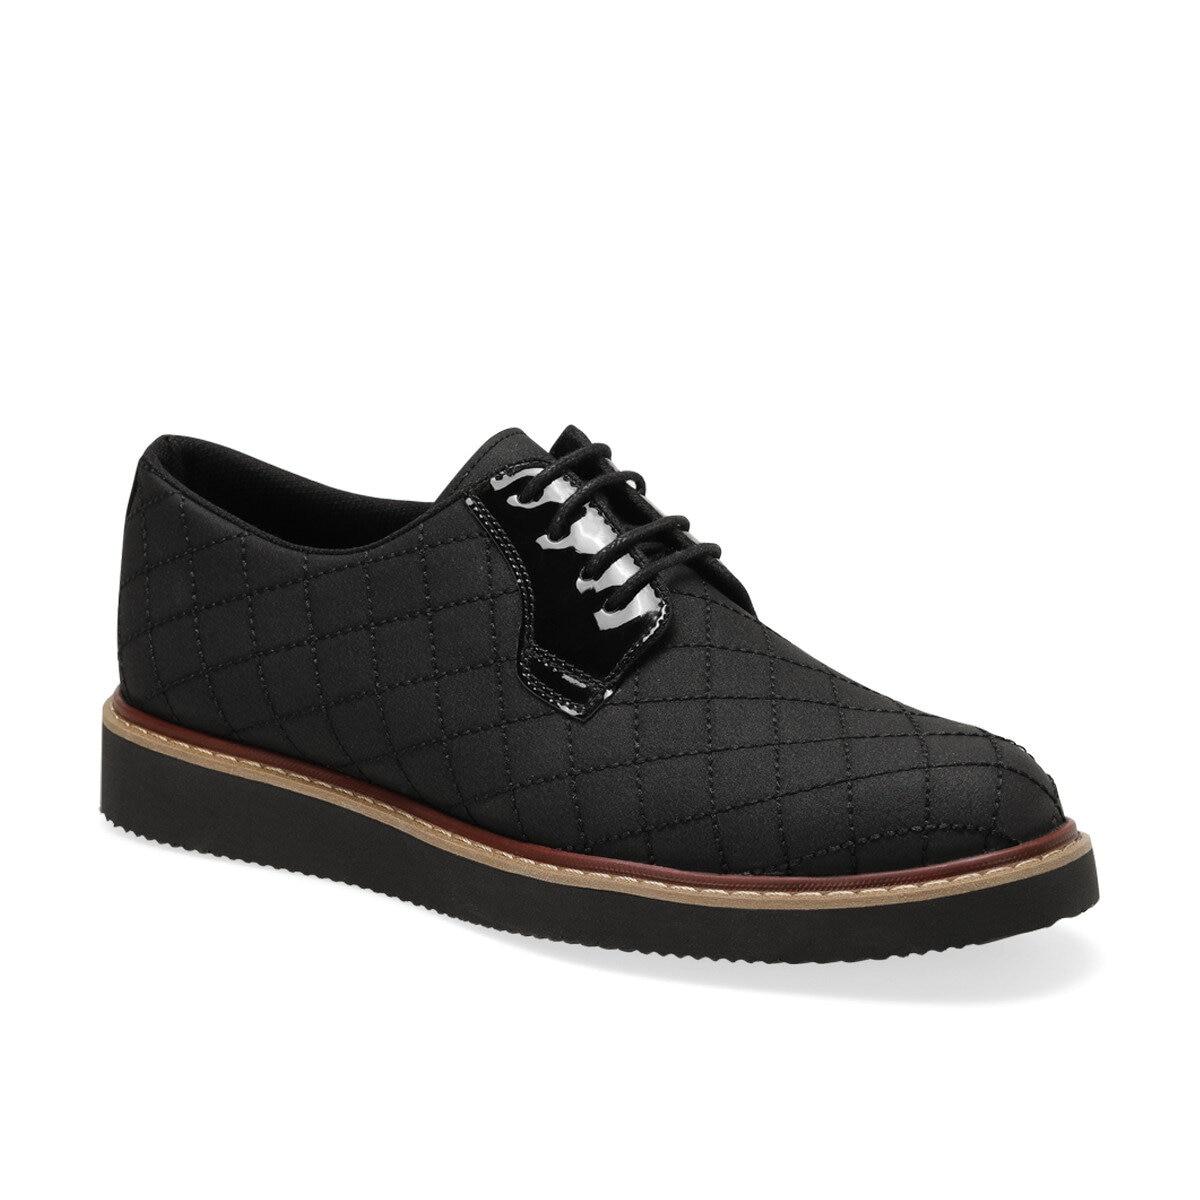 FLO 3321 Black Men Dress Shoes-Styles